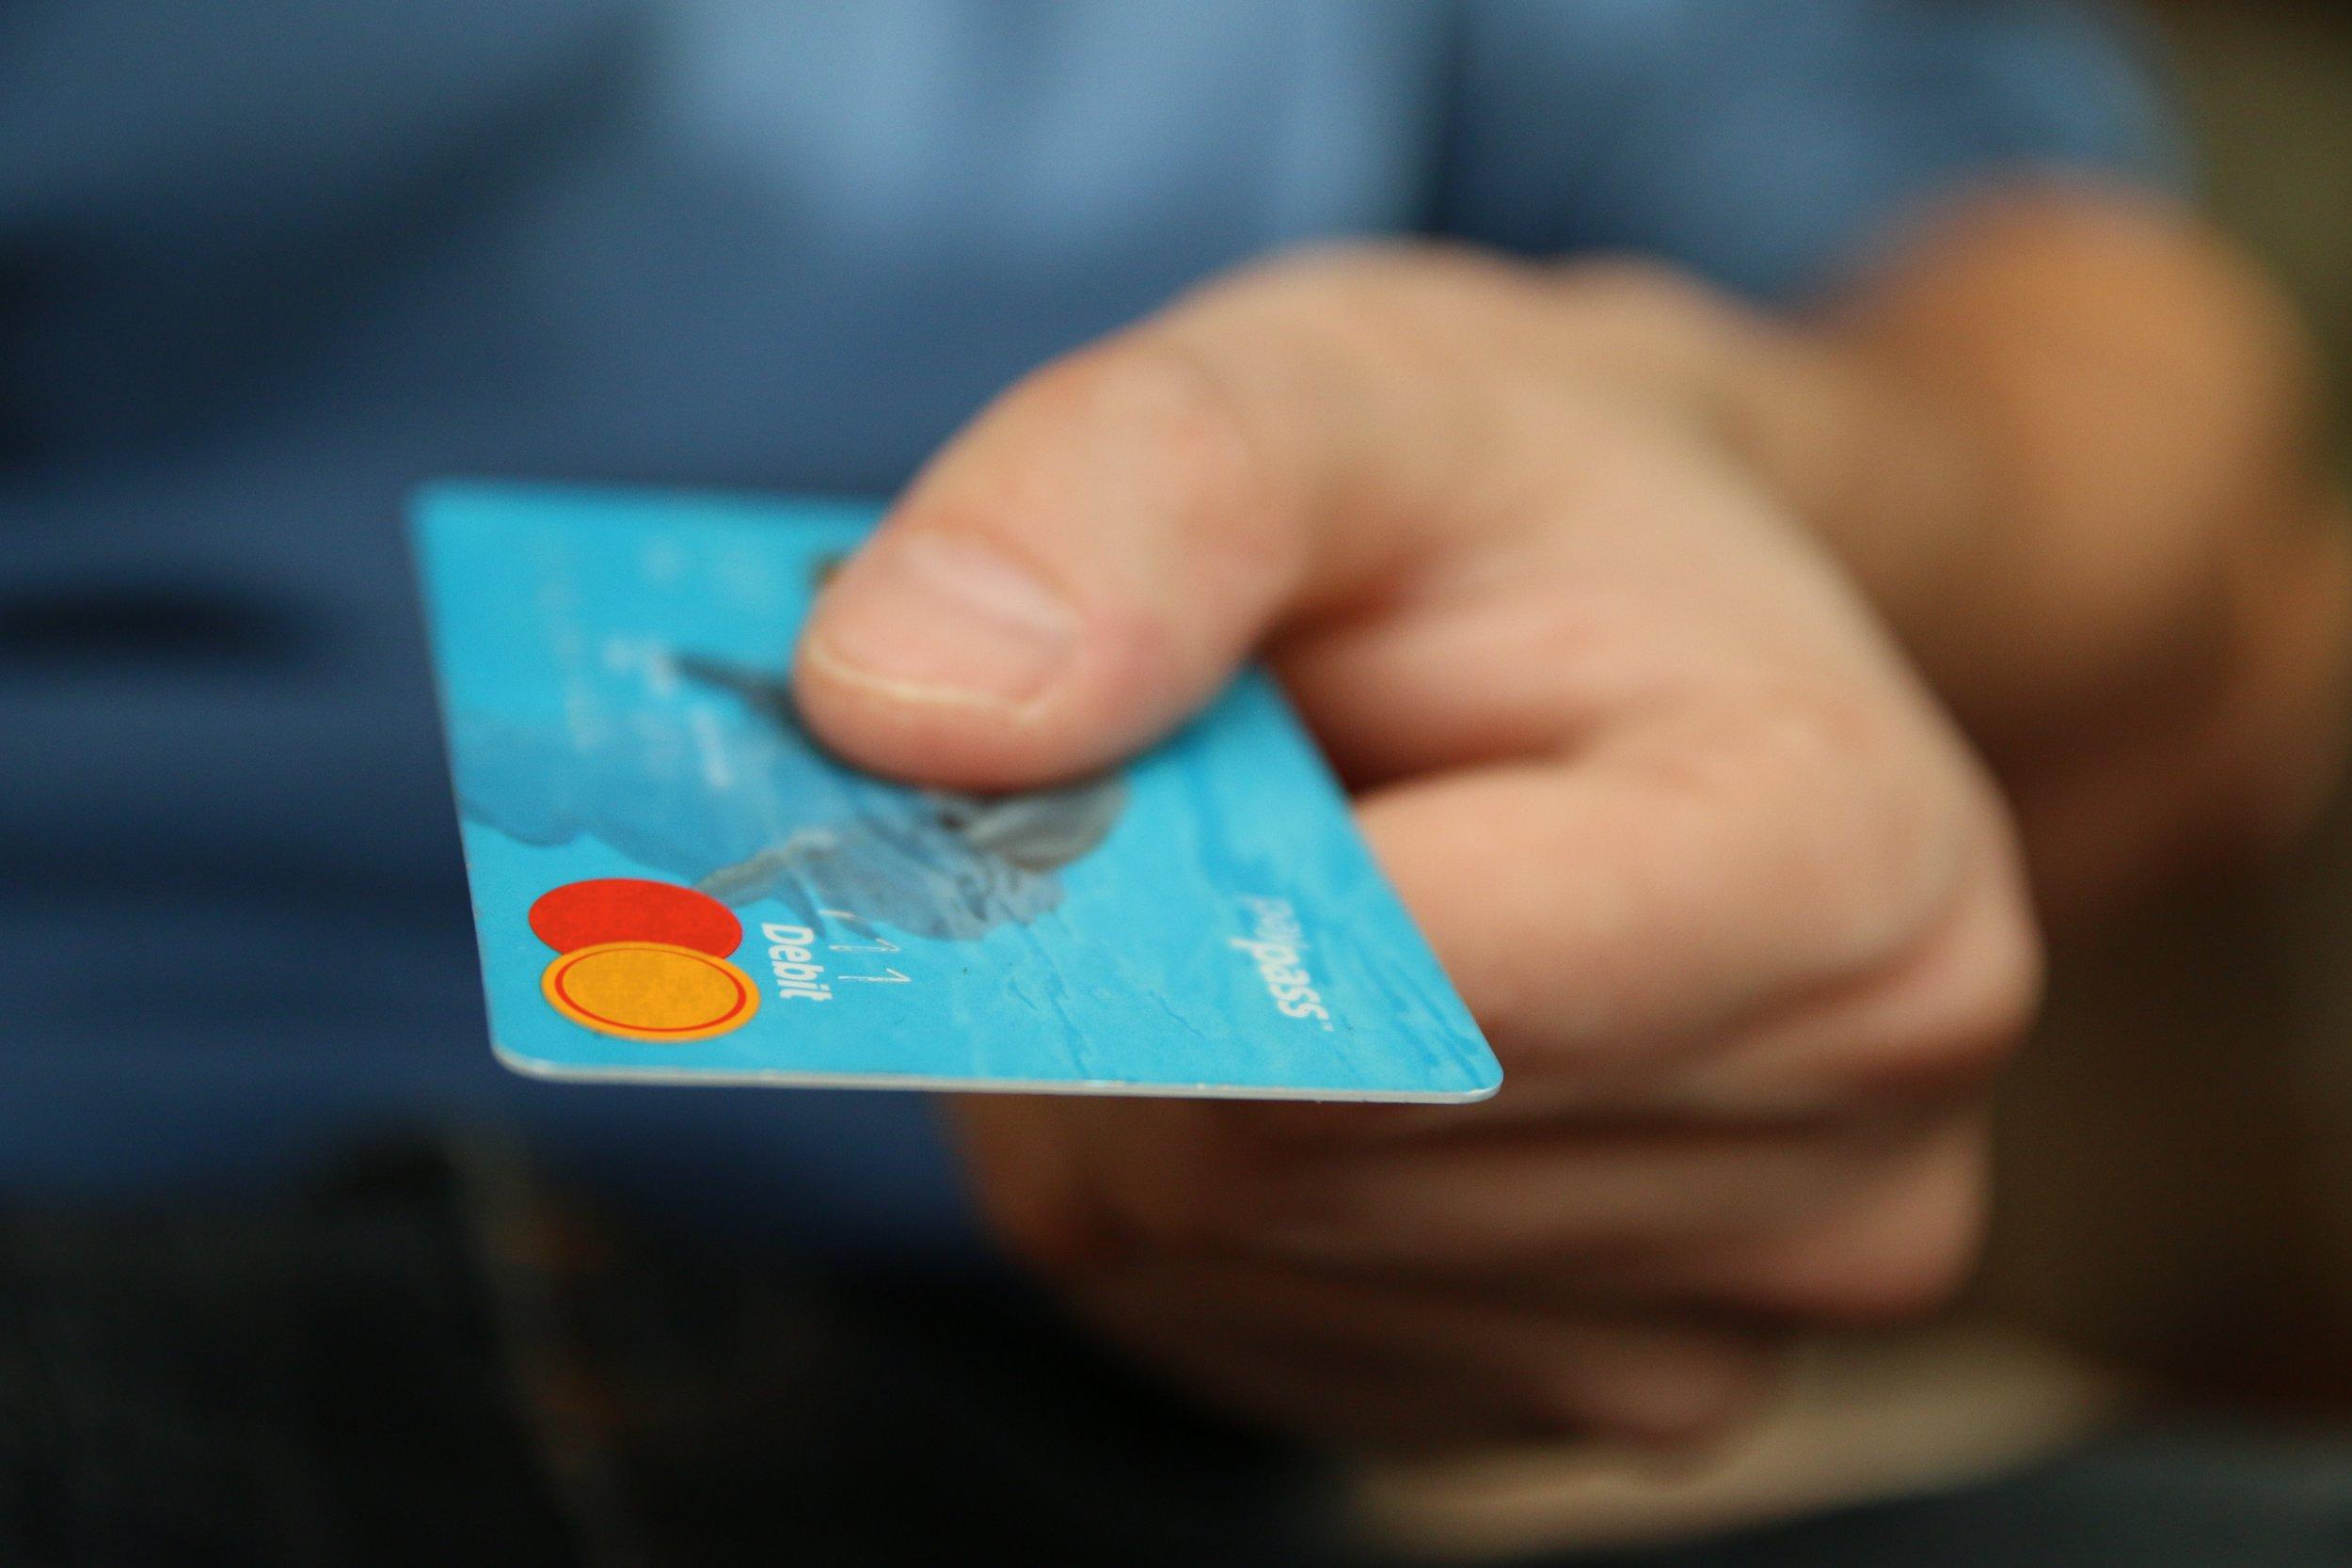 money-card-business-credit-card-50987.jpeg